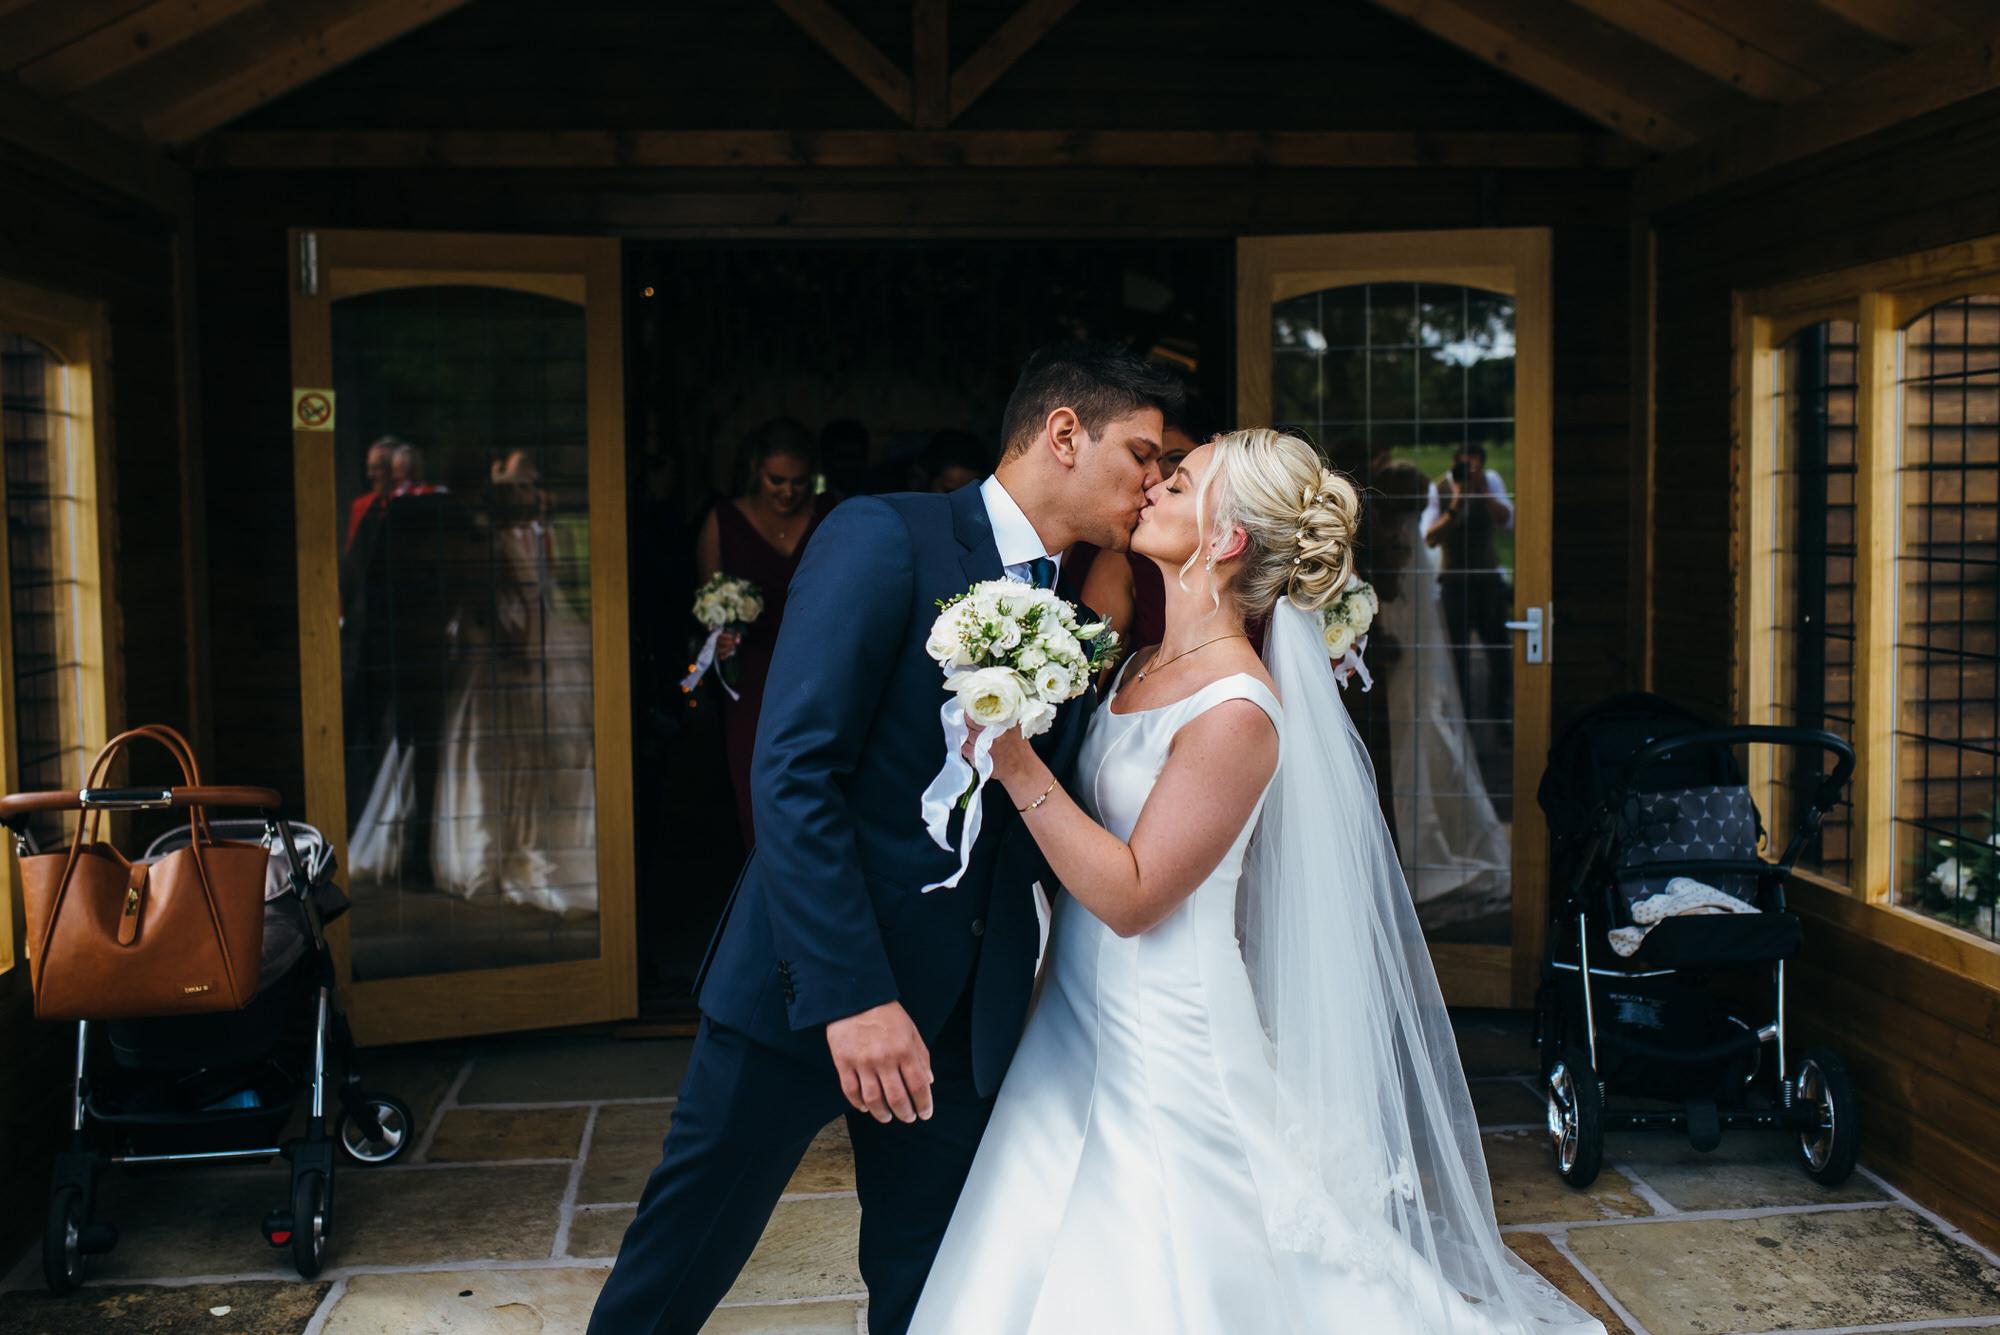 Merrydale manor wedding photography 049